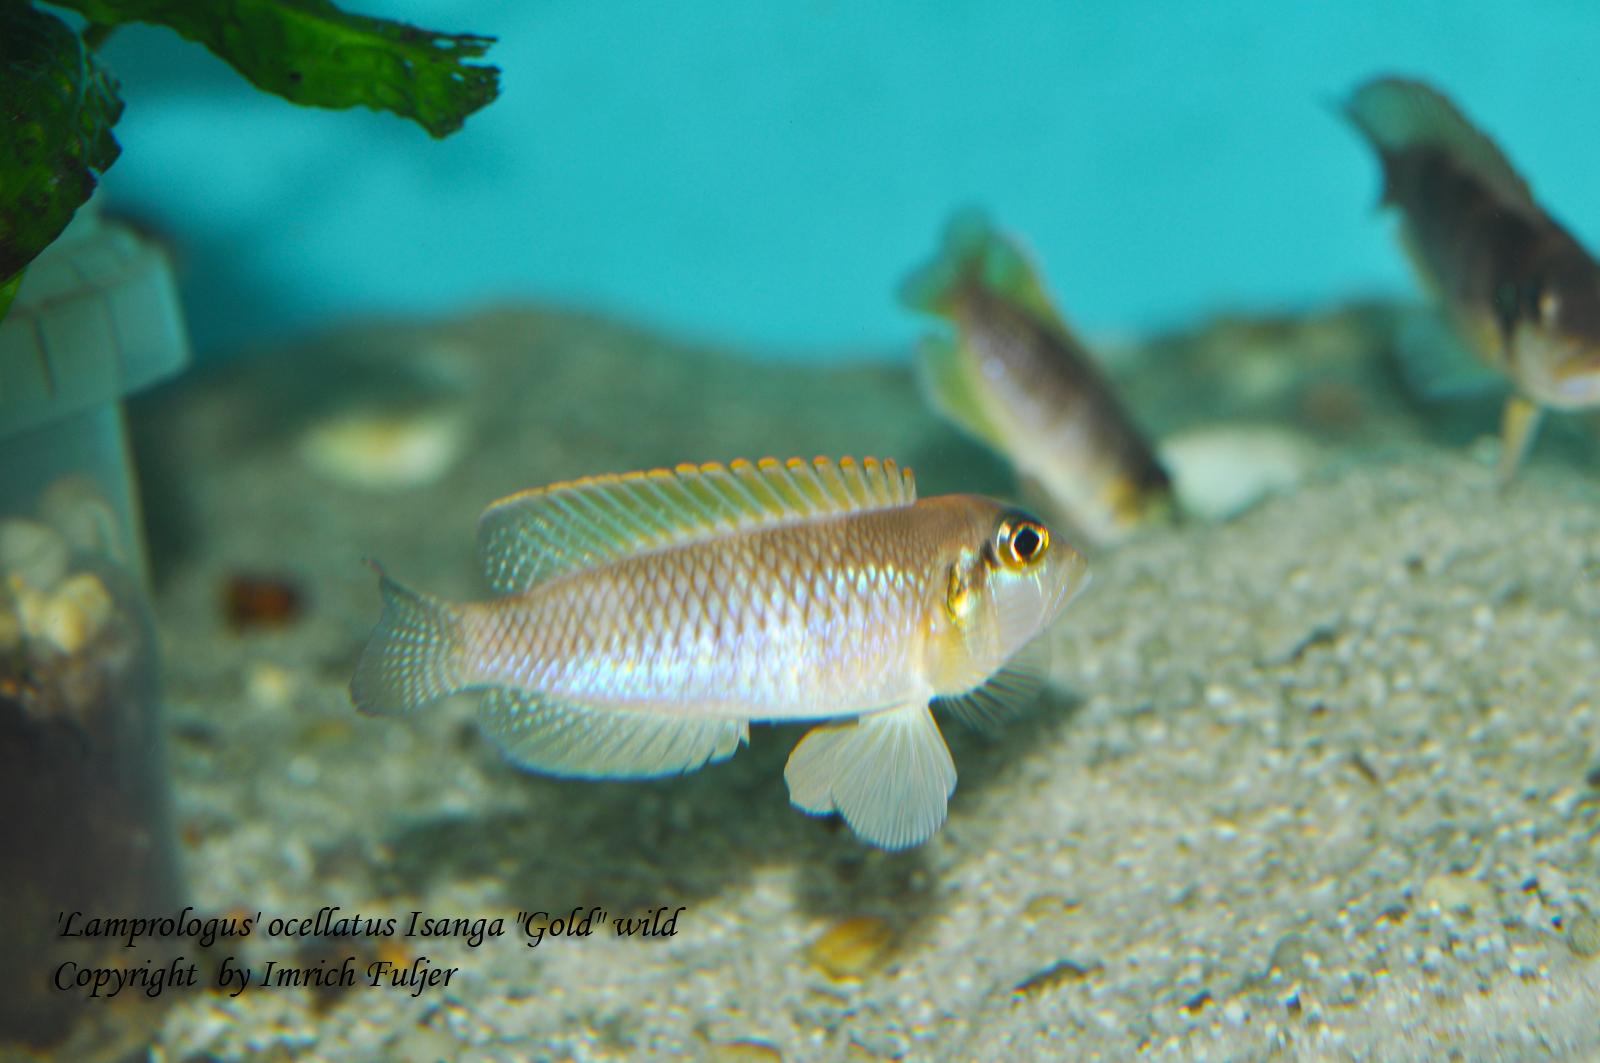 "'Lamprologus' ocellatus Isanga ""Gold"""